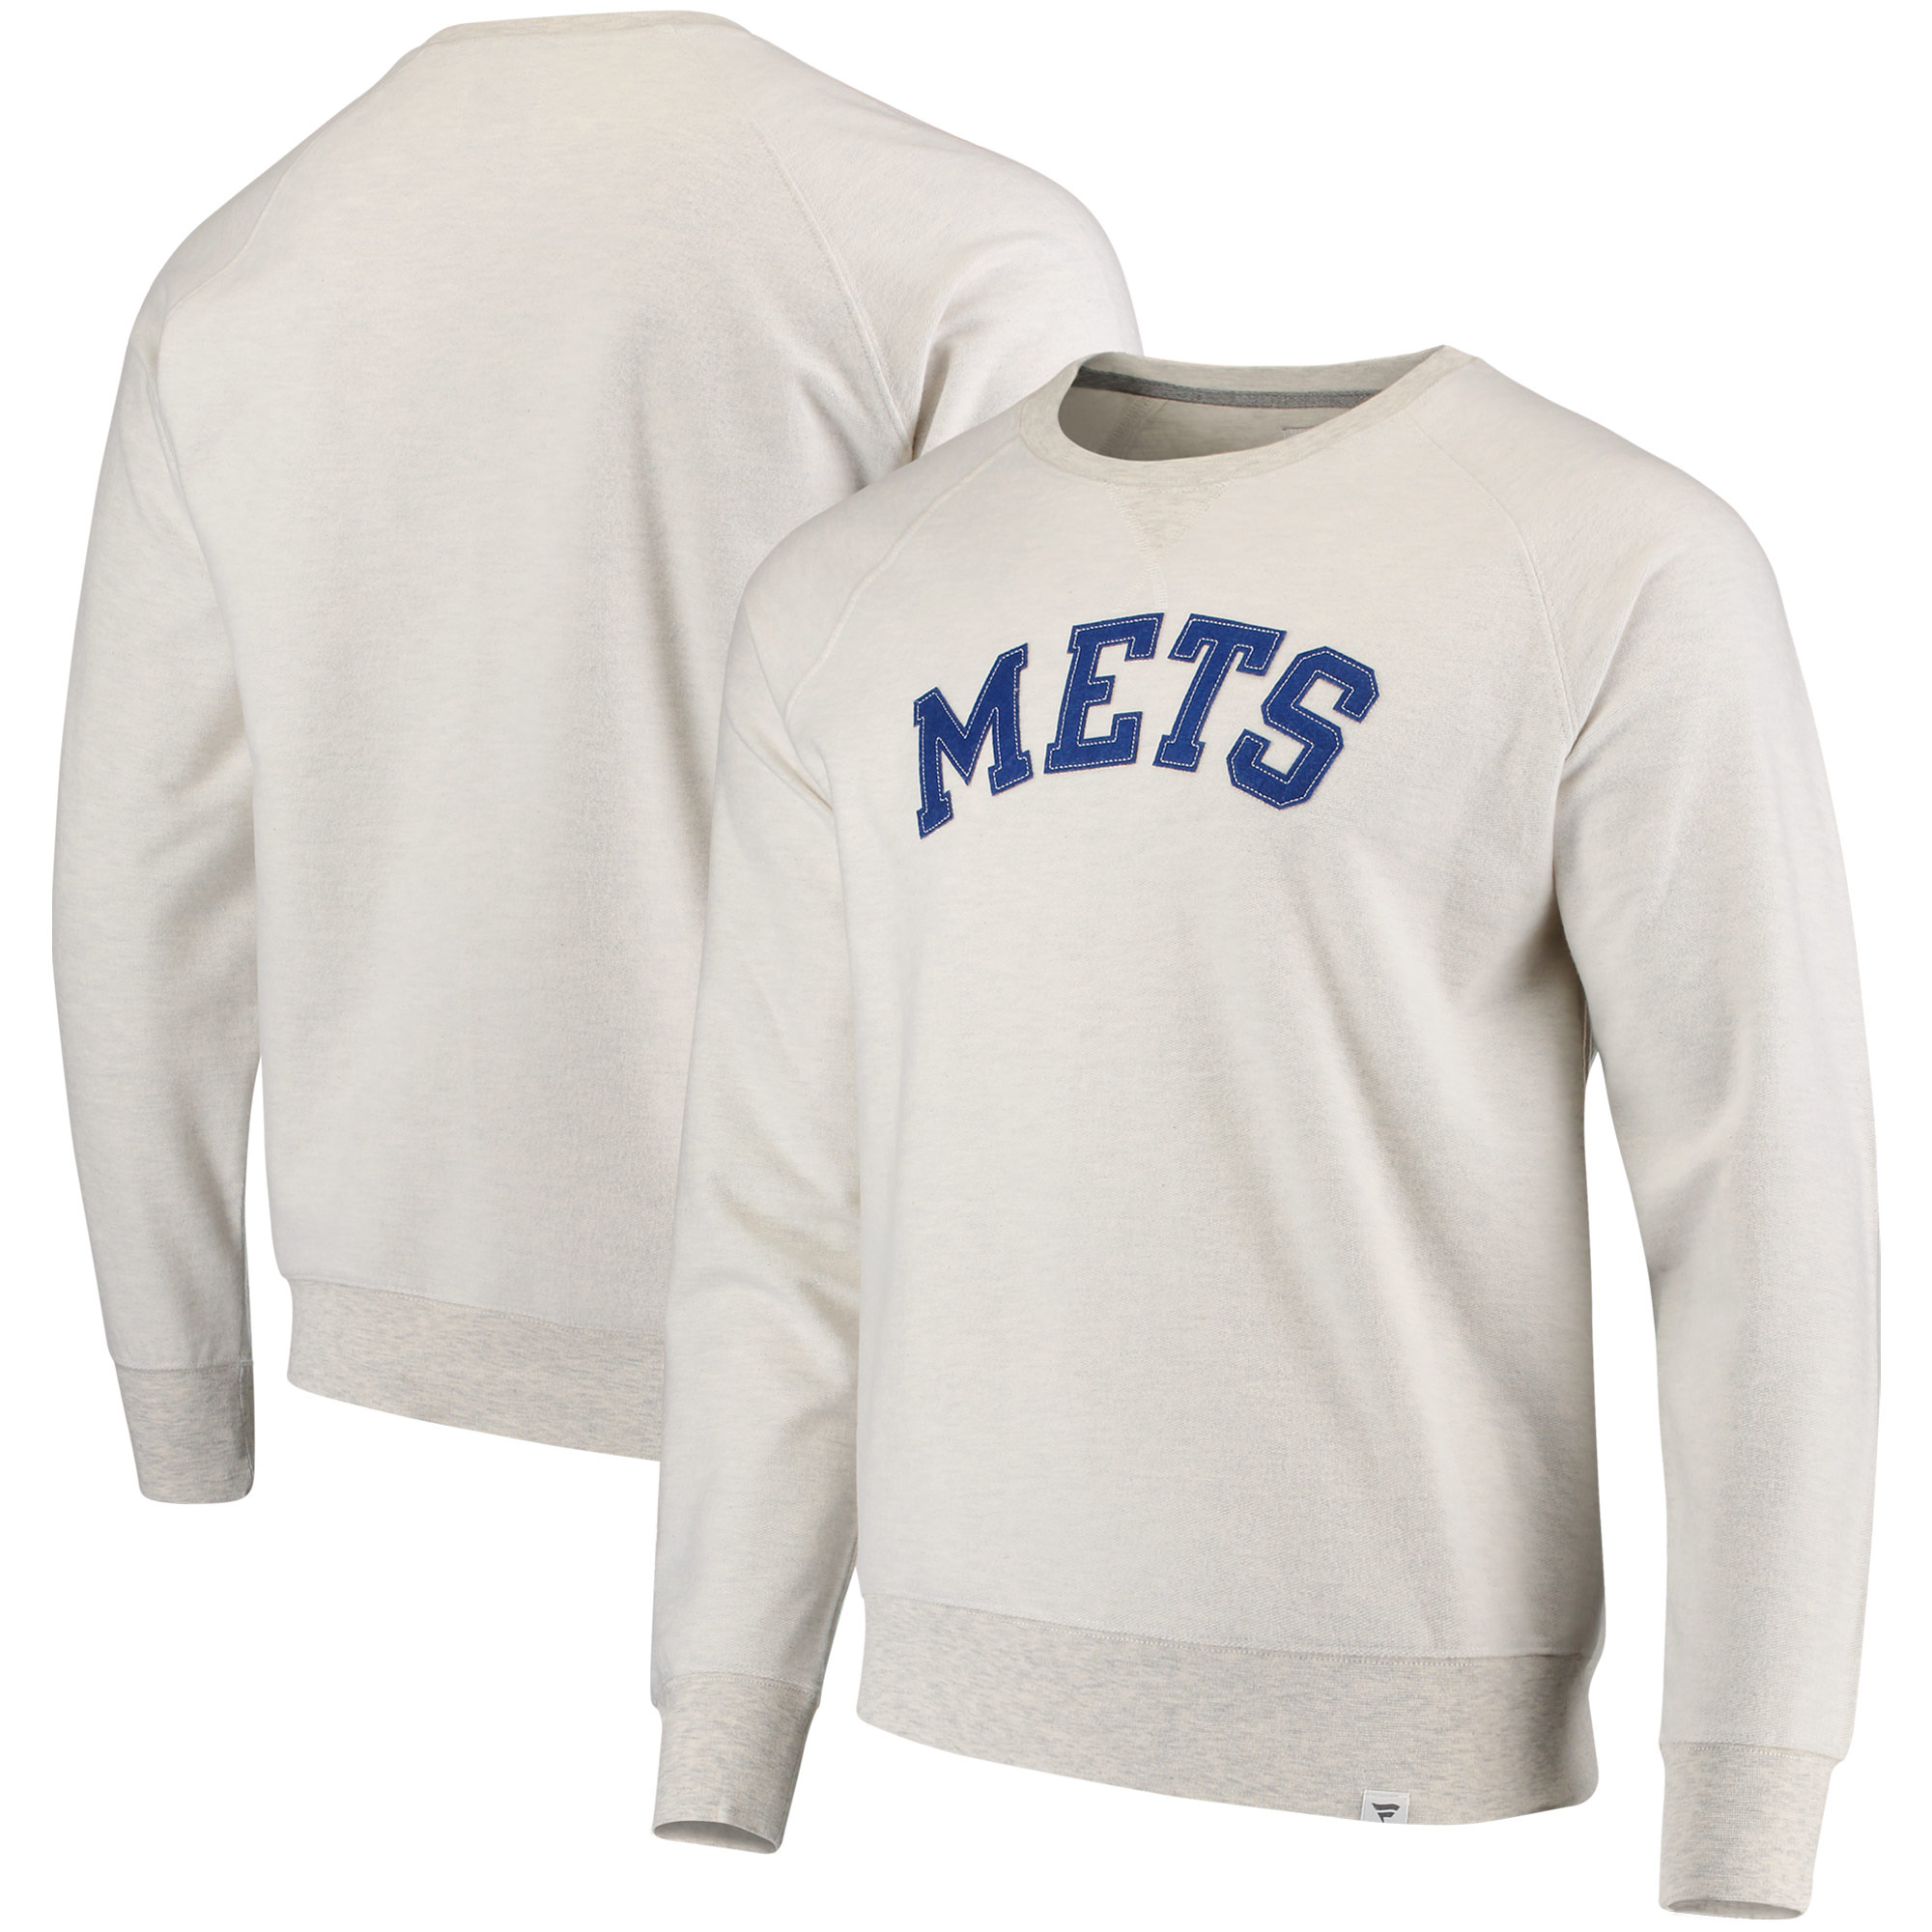 Men's Fanatics Branded Cream New York Mets True Classics French Terry Pullover Sweatshirt